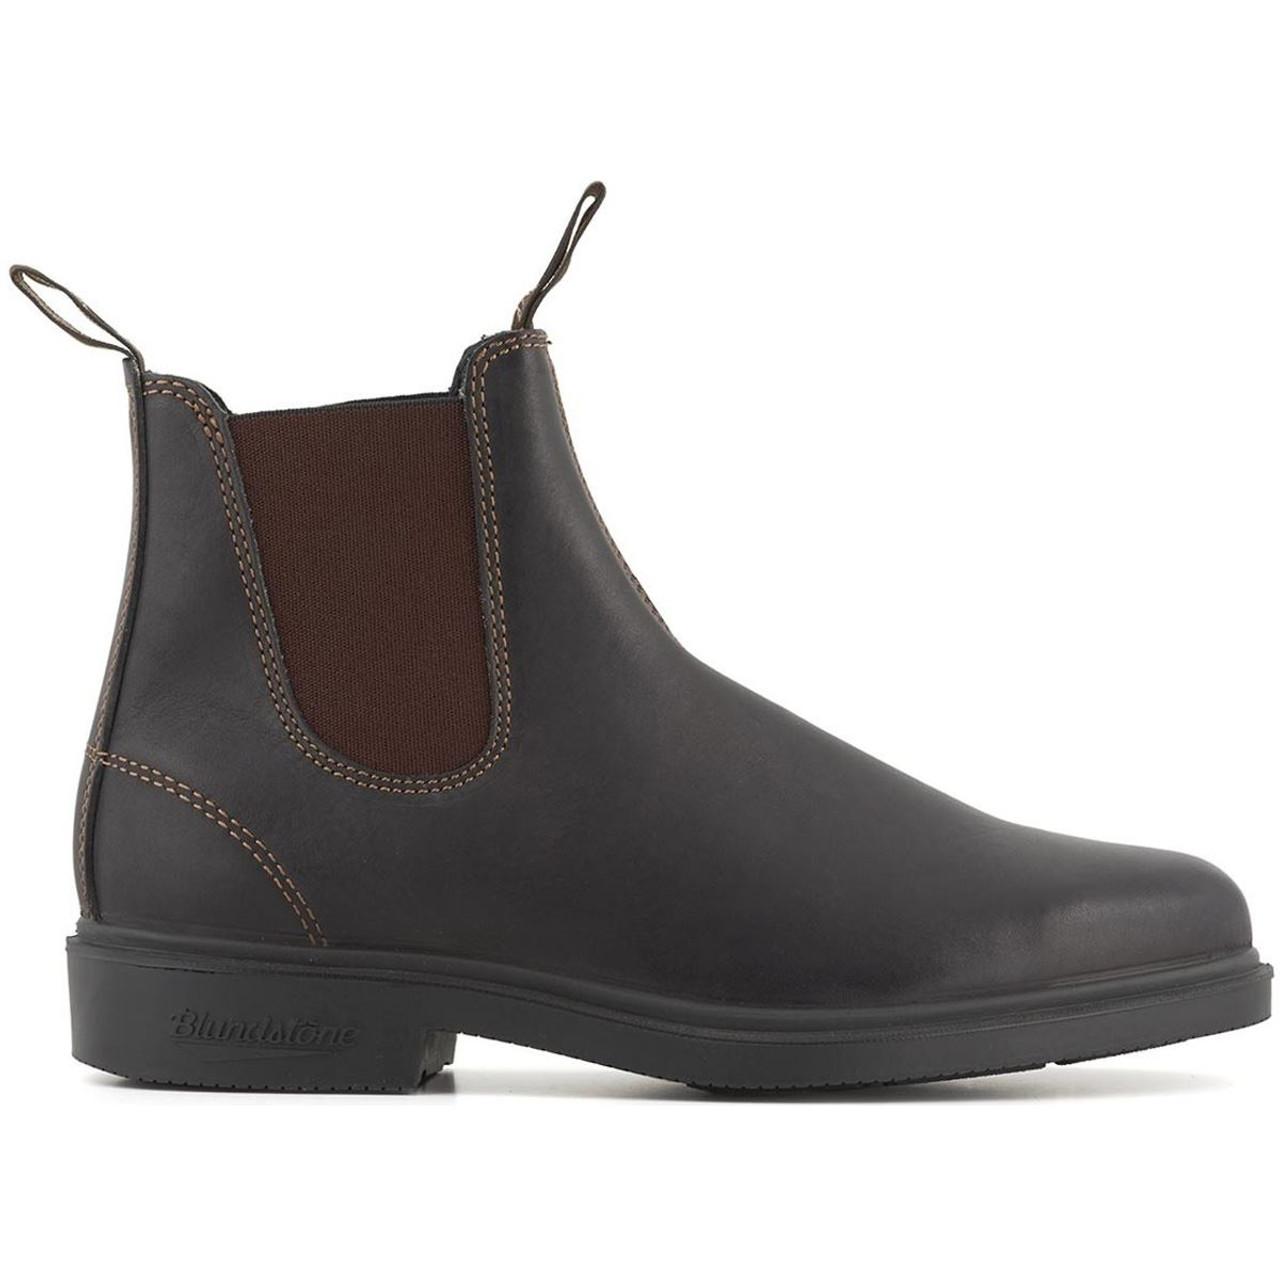 Blundstone 062 Chelsea Dress Boots